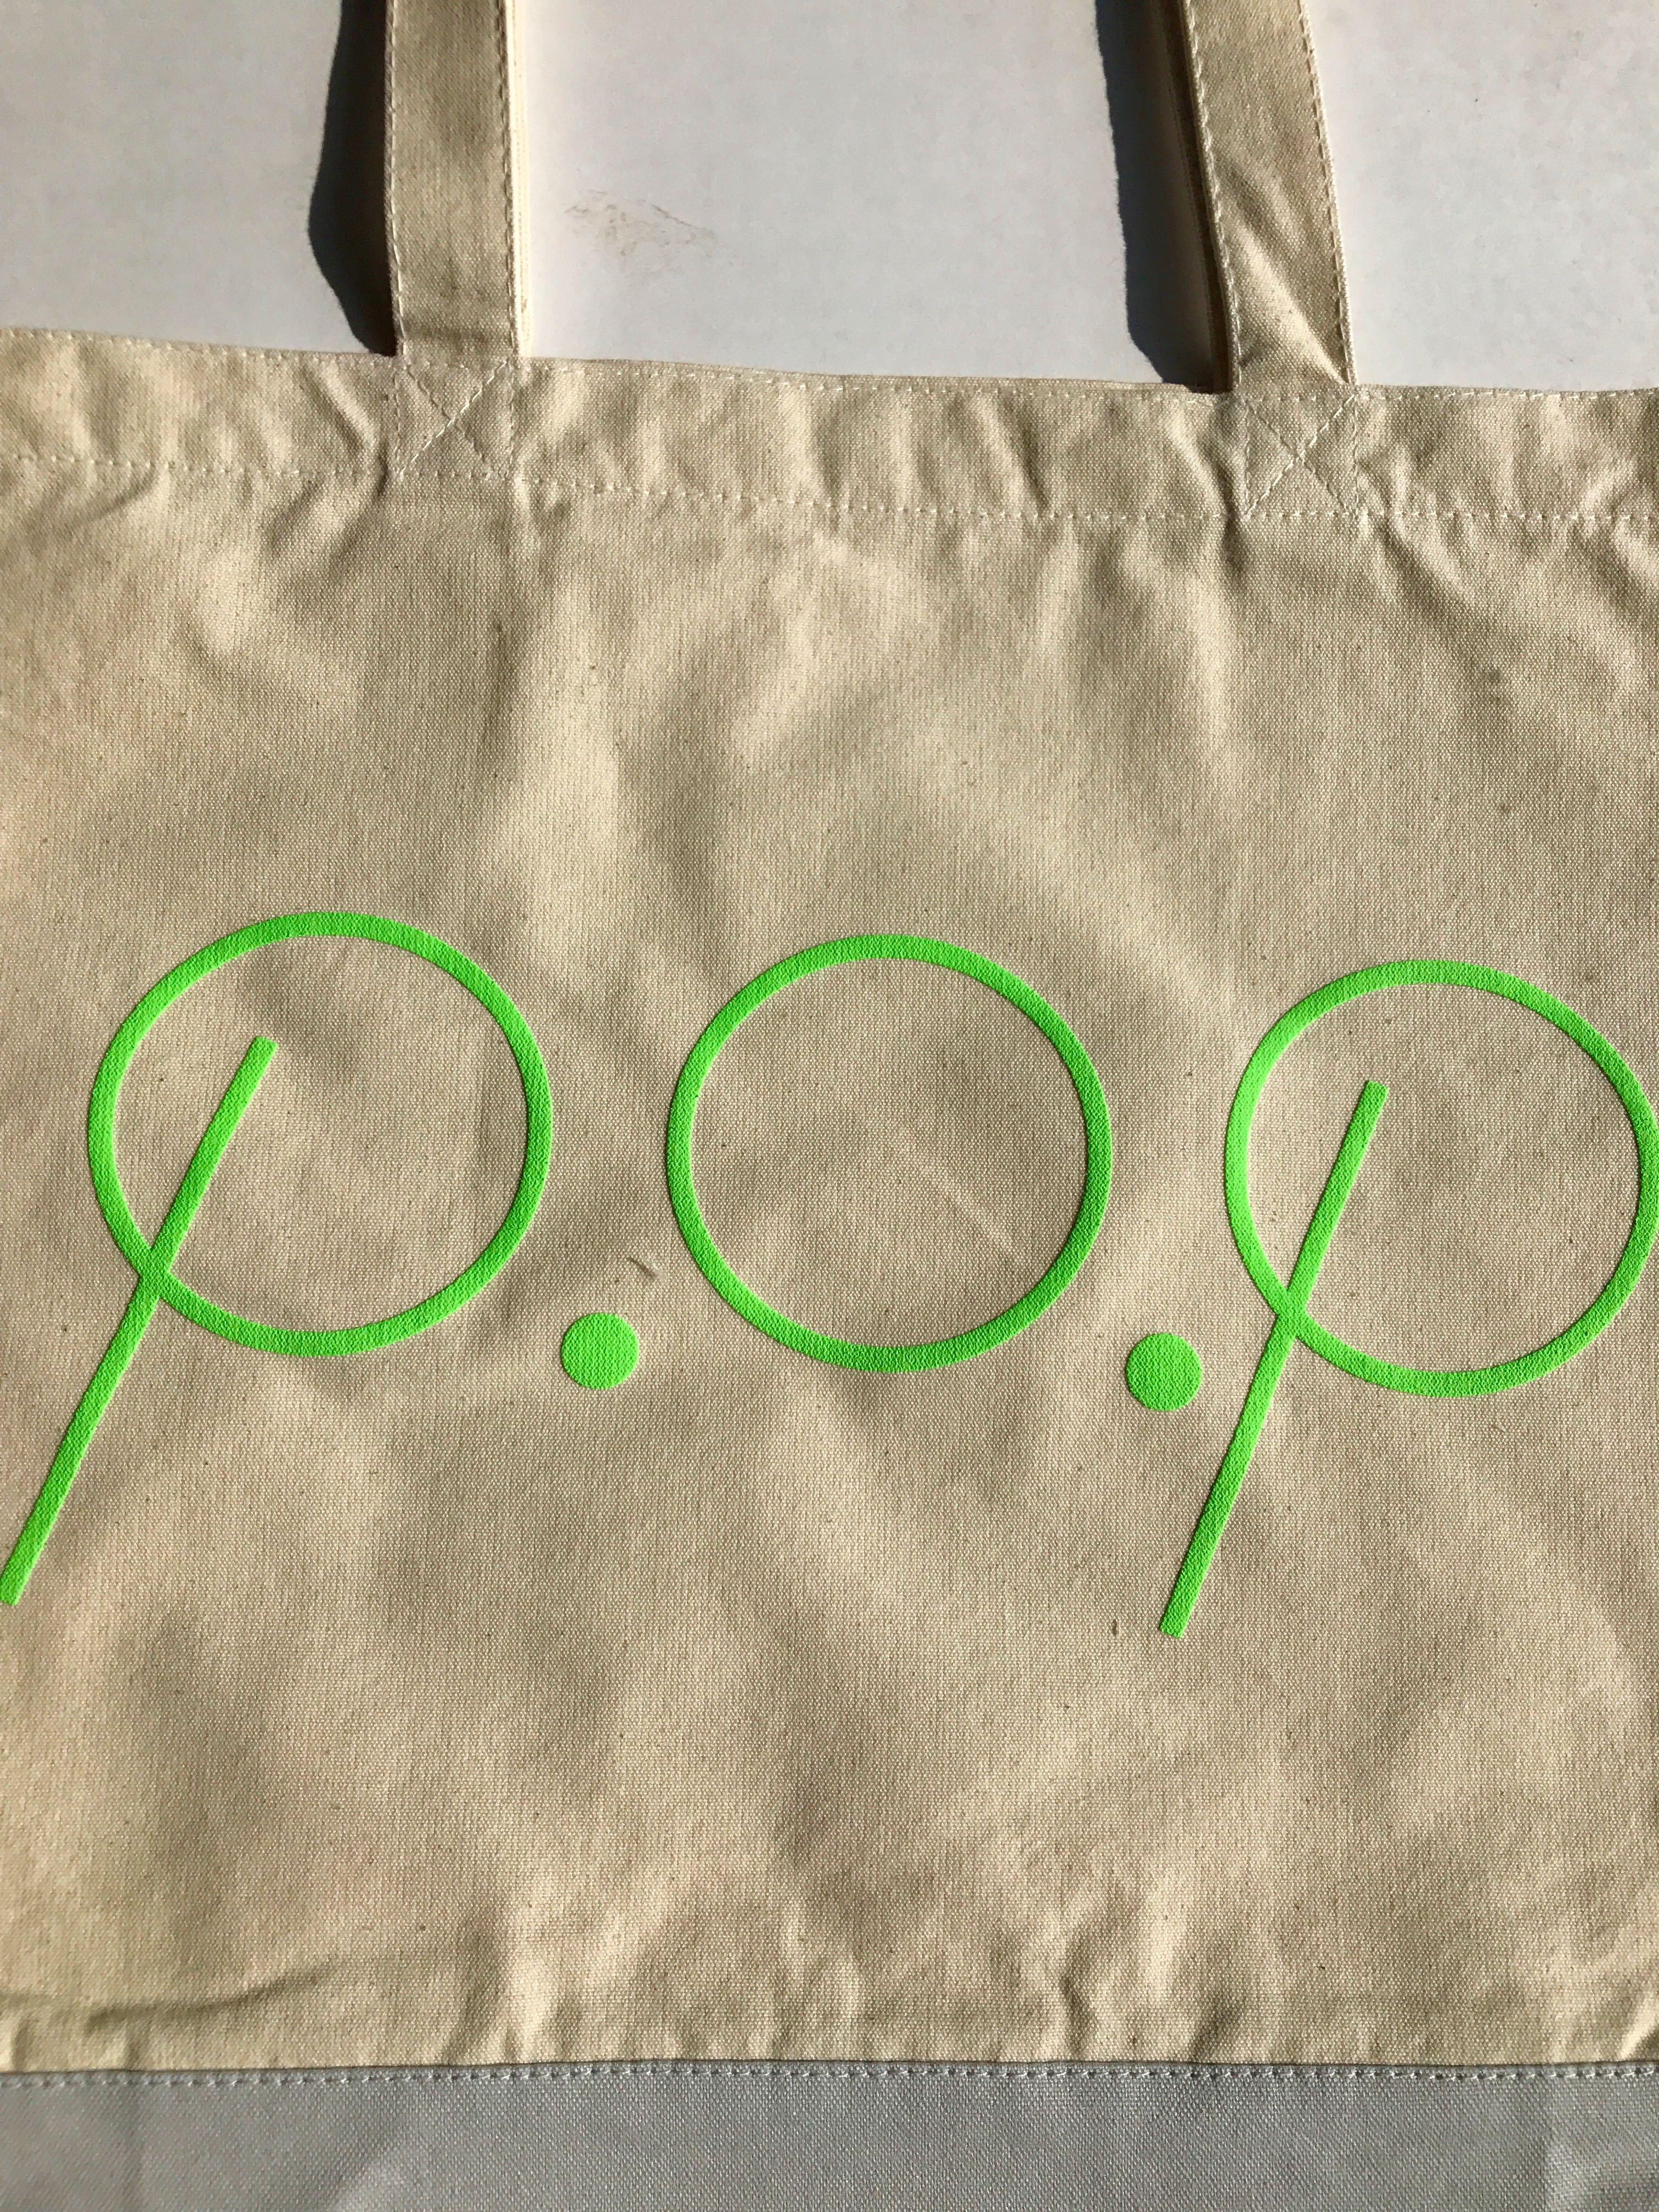 P.O.P トートバッグ 蛍光グリーン - 画像1